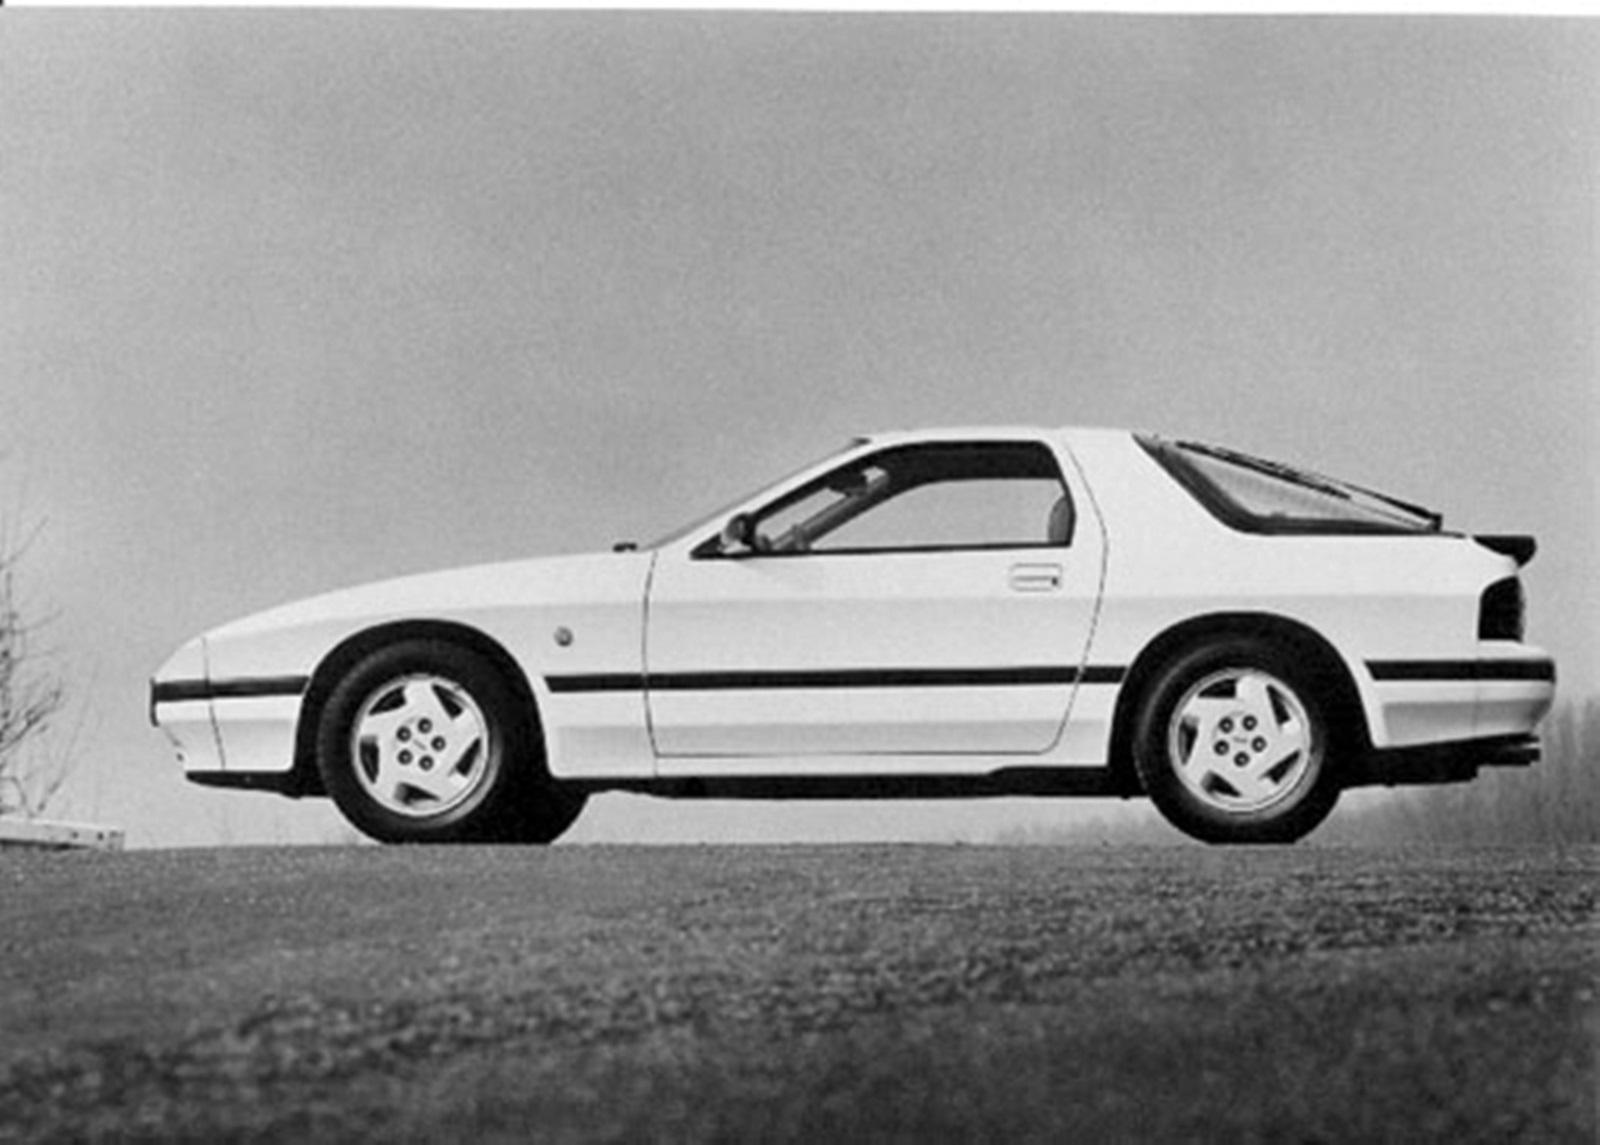 Mazda Rx 7 1986 020 Copy